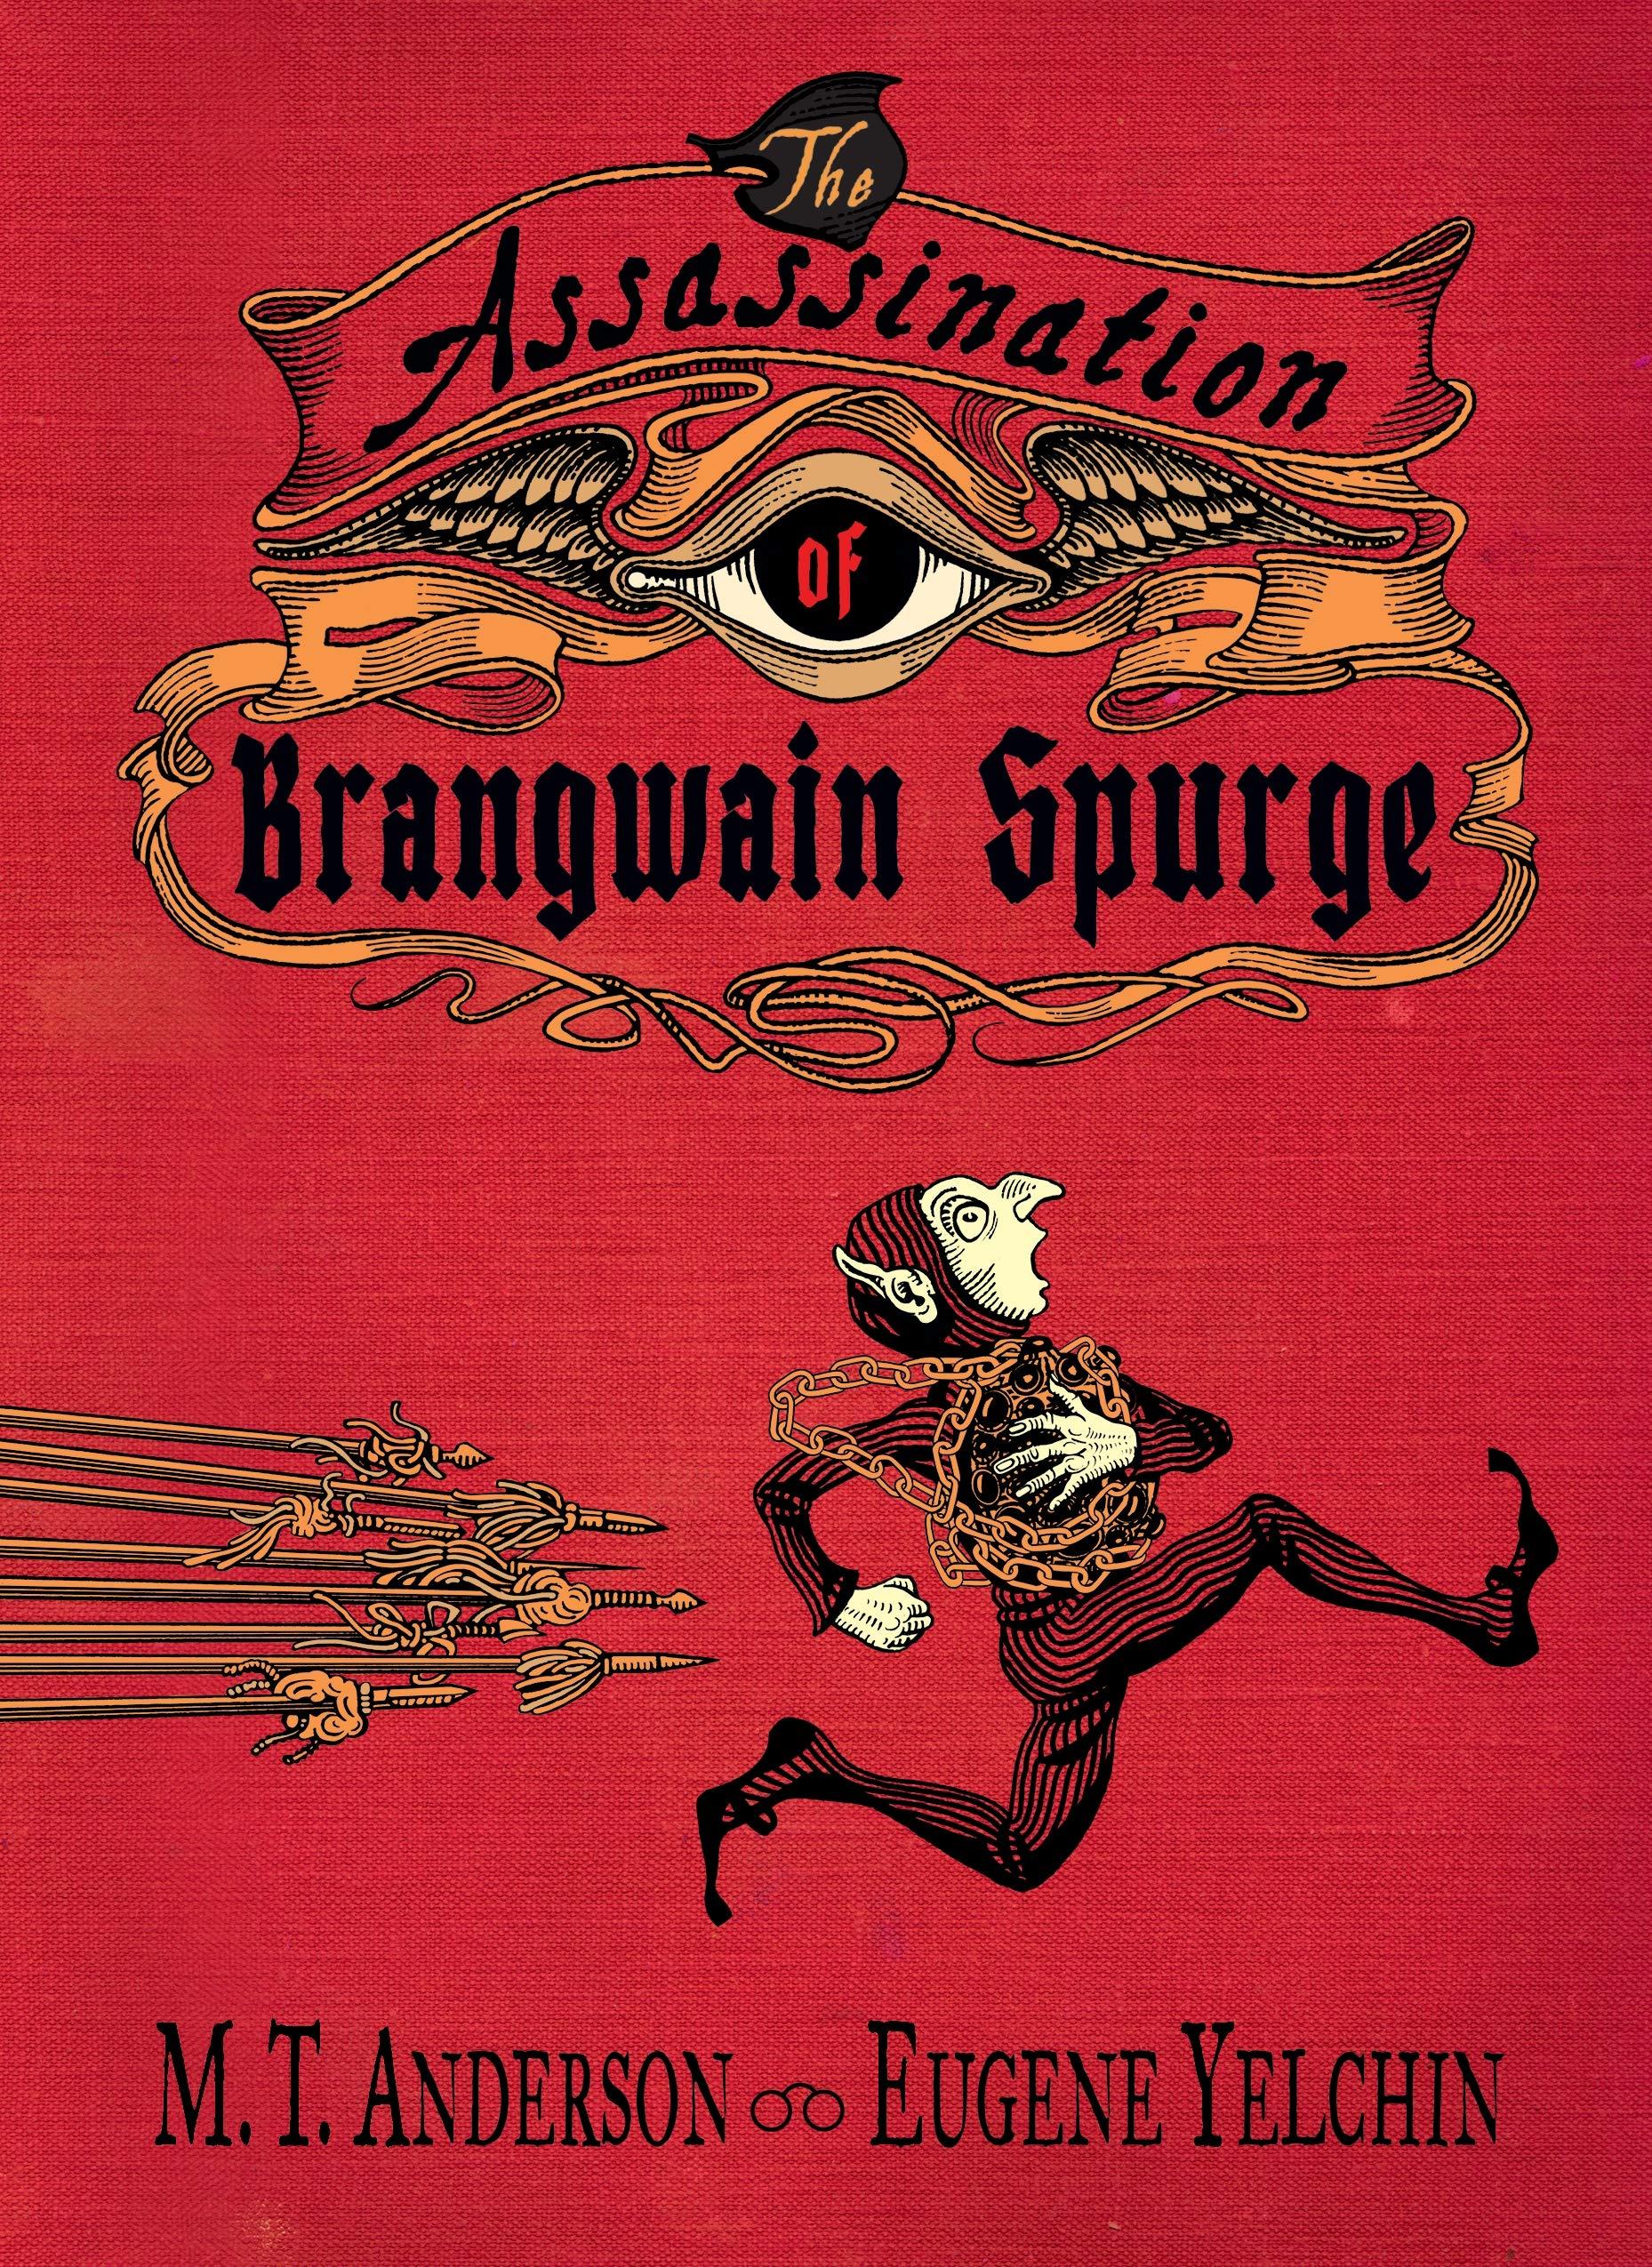 Amazon.com: The Assassination of Brangwain Spurge (9780763698225): Anderson, M.T., Yelchin, Eugene, Yelchin, Eugene: Books